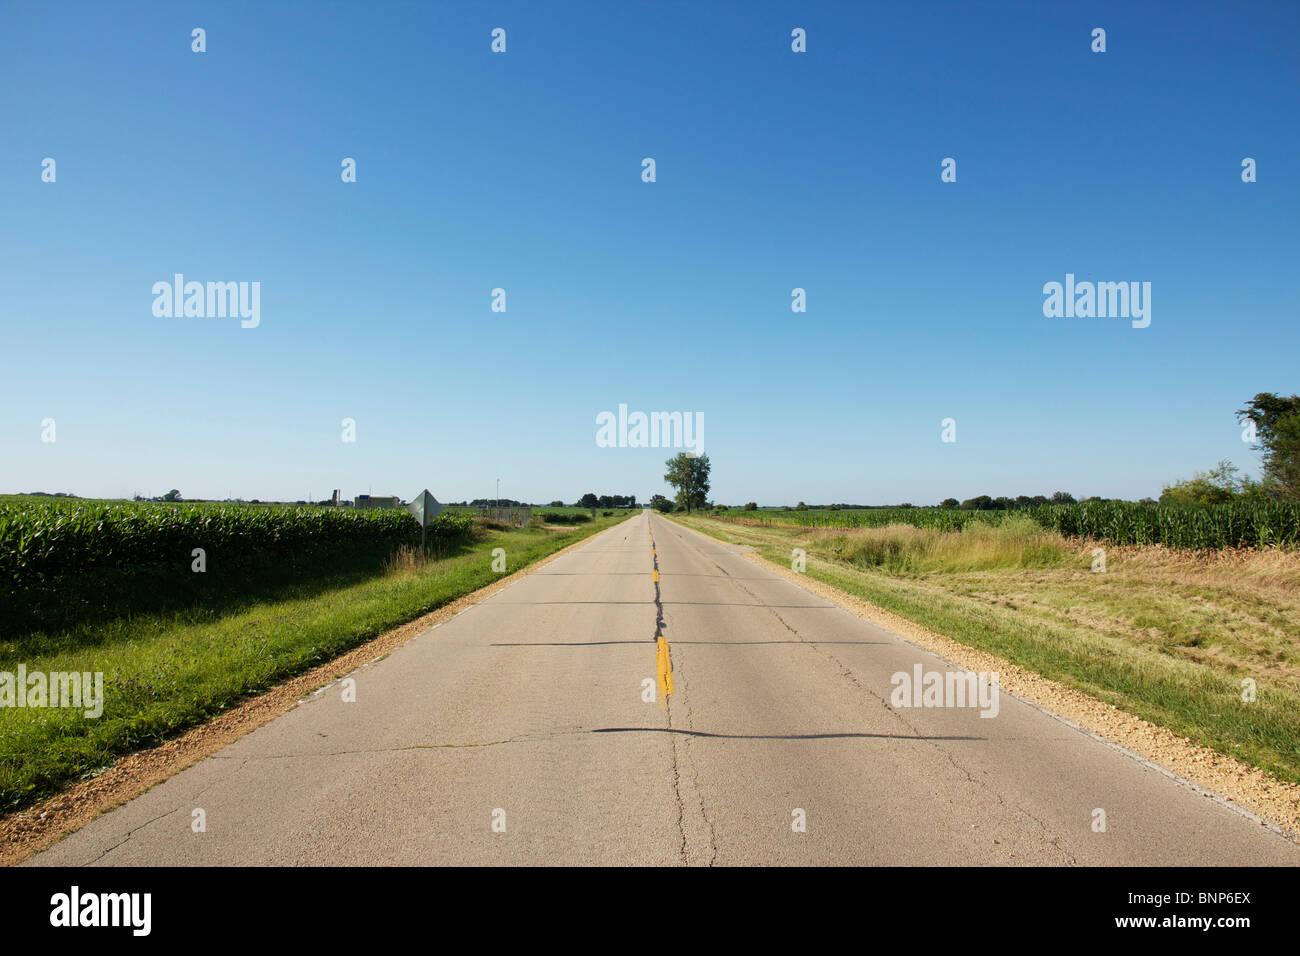 County Highway 15 nördlich von Harmon, Illinois. Stockbild